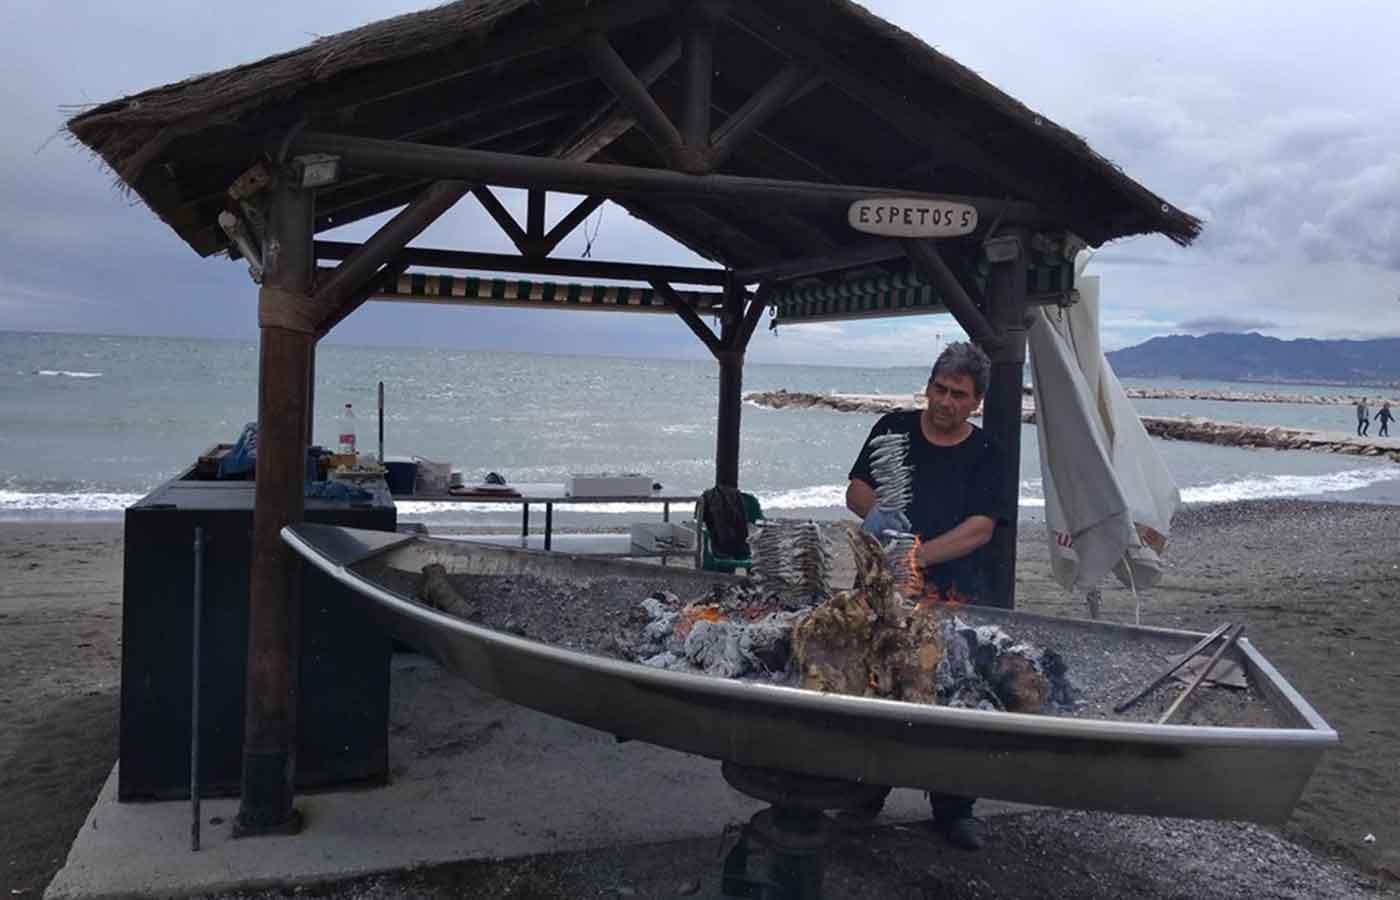 Malagueño asando sardinas espetadas en la playa